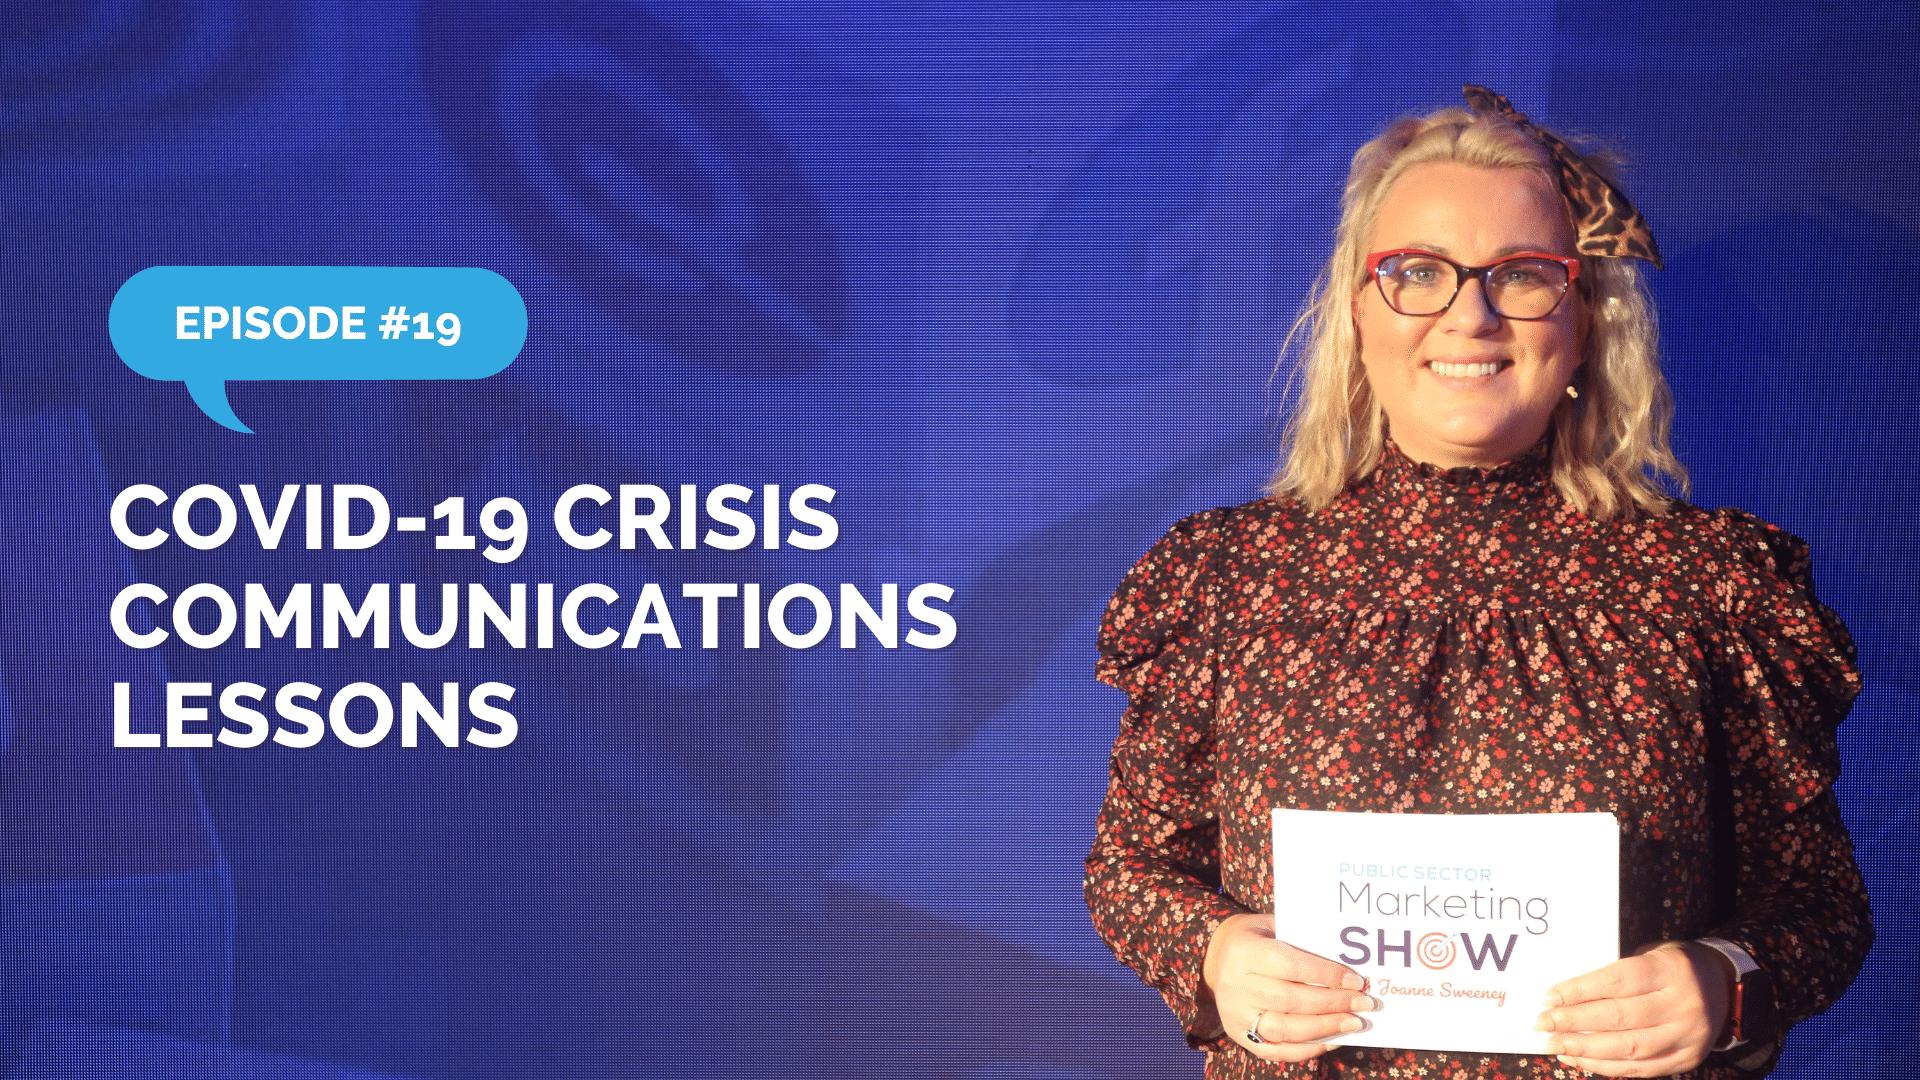 Episode 19 - COVID-19 Crisis Communications Lessons